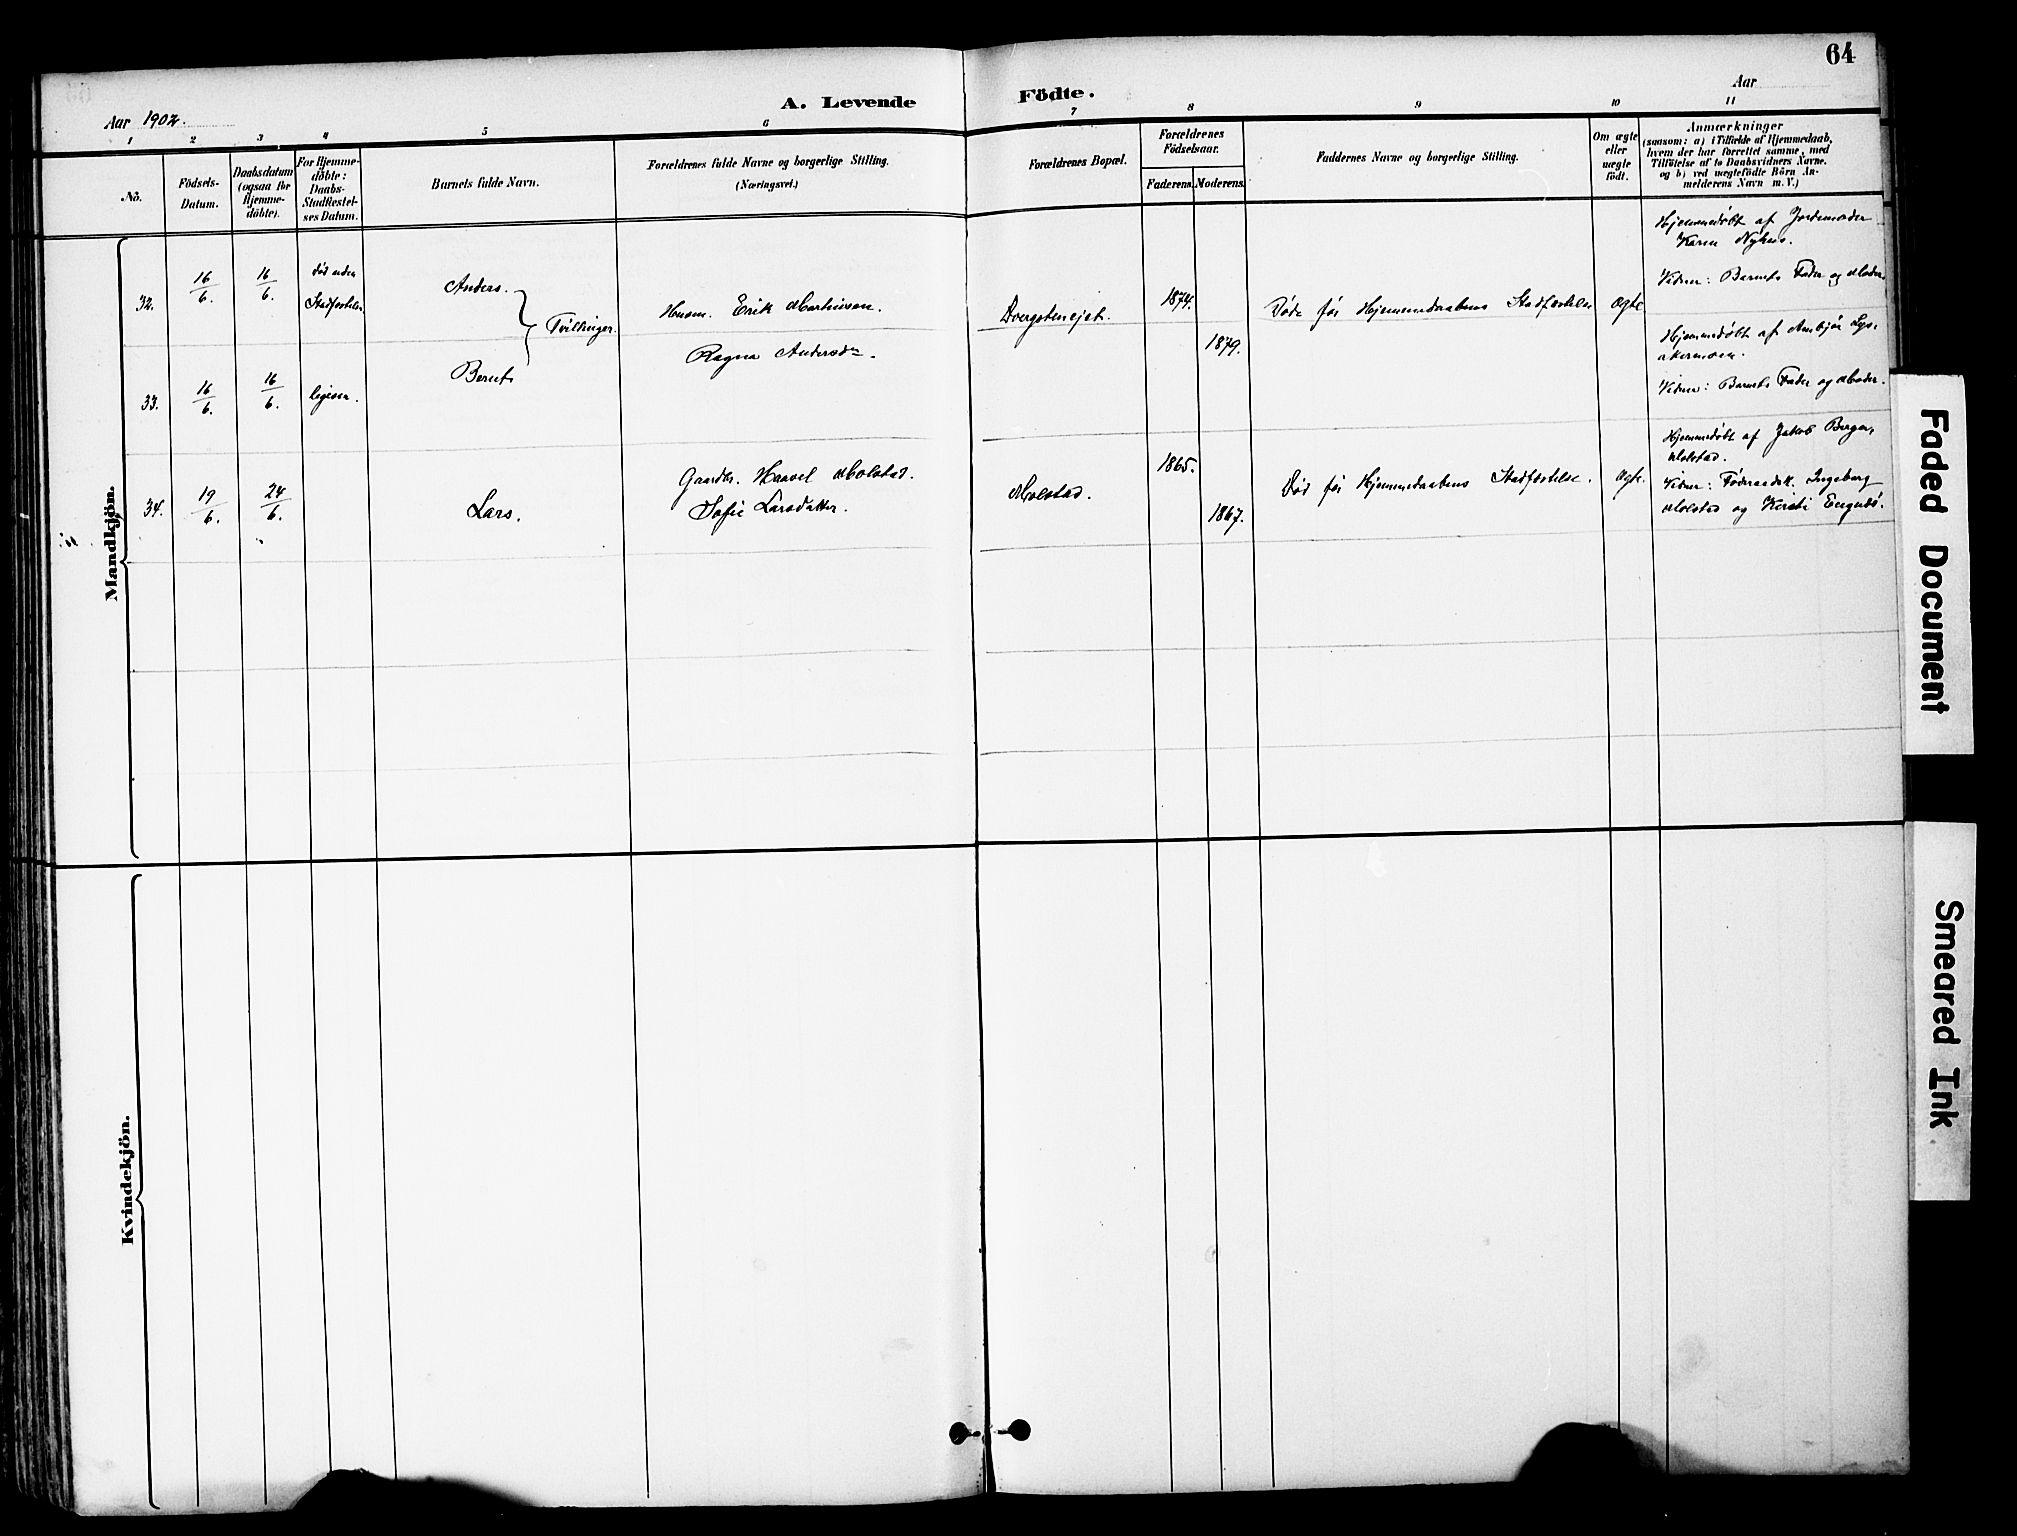 SAH, Brandbu prestekontor, Klokkerbok nr. 6, 1893-1902, s. 64